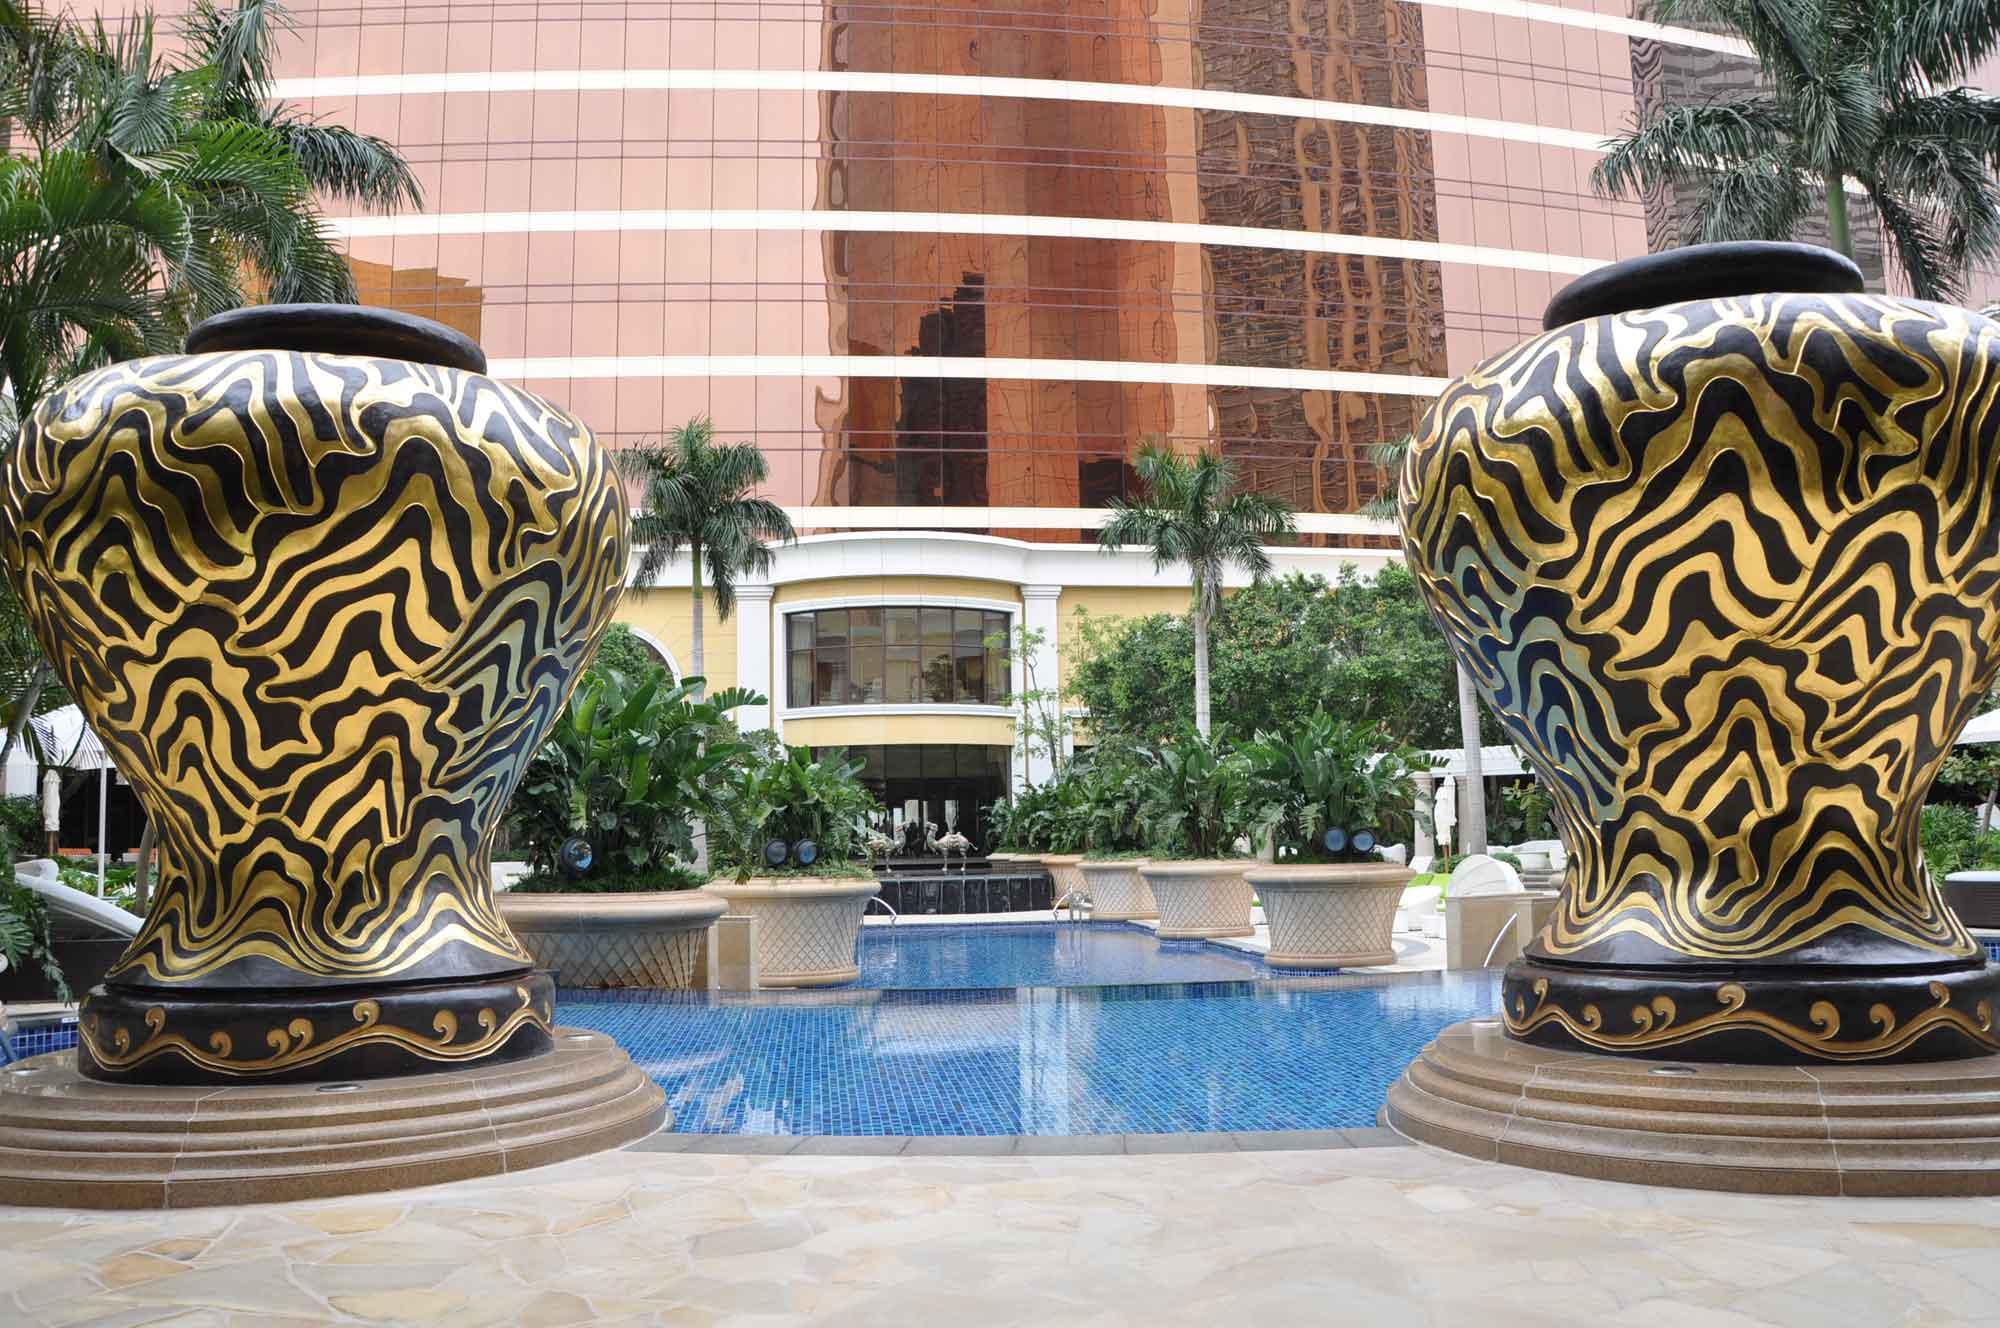 Wynn Macau giant pool vases